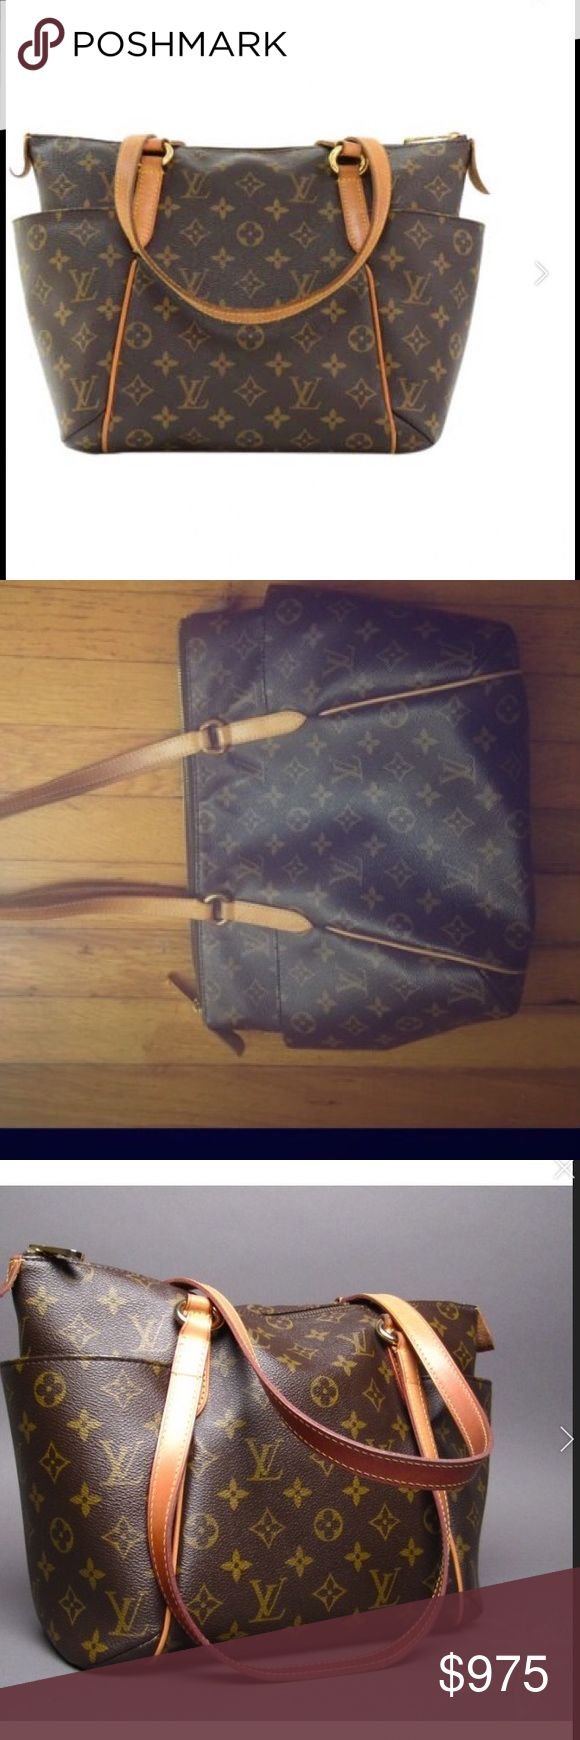 Louis Vuitton Handbag PM 👜👜👜 Vintage & rare Louis Vuitton handbag in original colors brown/tan.  A classic & 100% real purse. 👜💯 Louis Vuitton Bags Totes